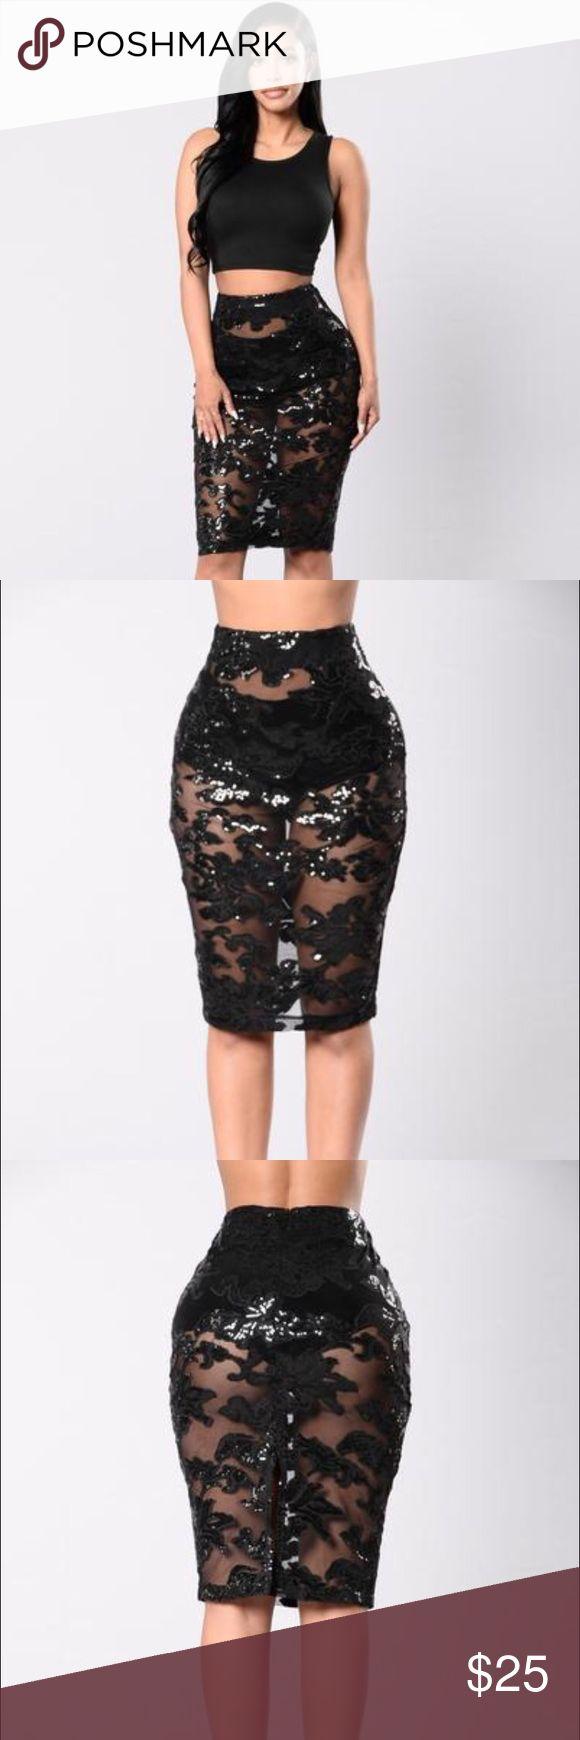 Glam Night Out Skirt- Black SOLD OUT EVERWHERE Sheer Black Sequin Skirt, Midi length, Slit in back Fashion Nova Skirts Midi